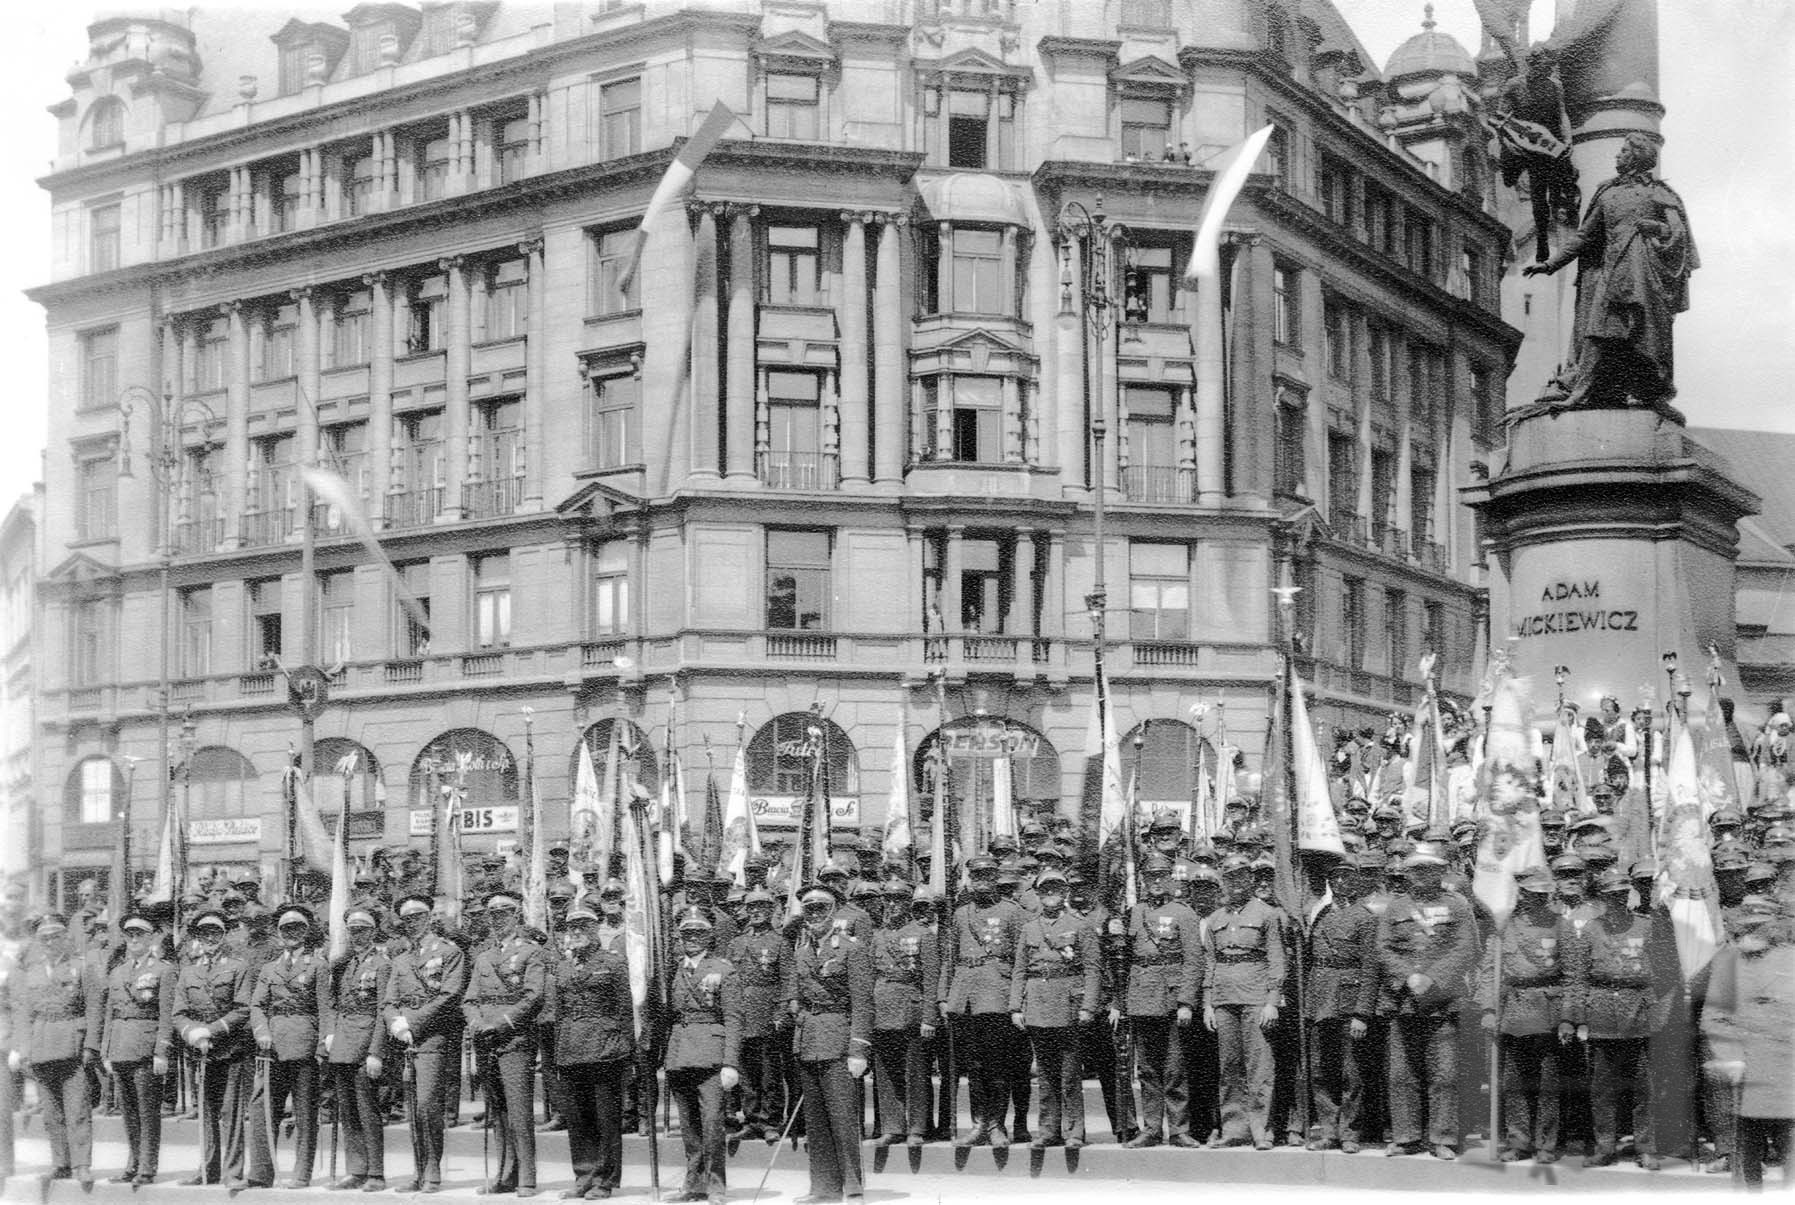 The main Polish Parties in Lviv and the Lviv Region during the Sanacija Period in Poland (1926-1939)